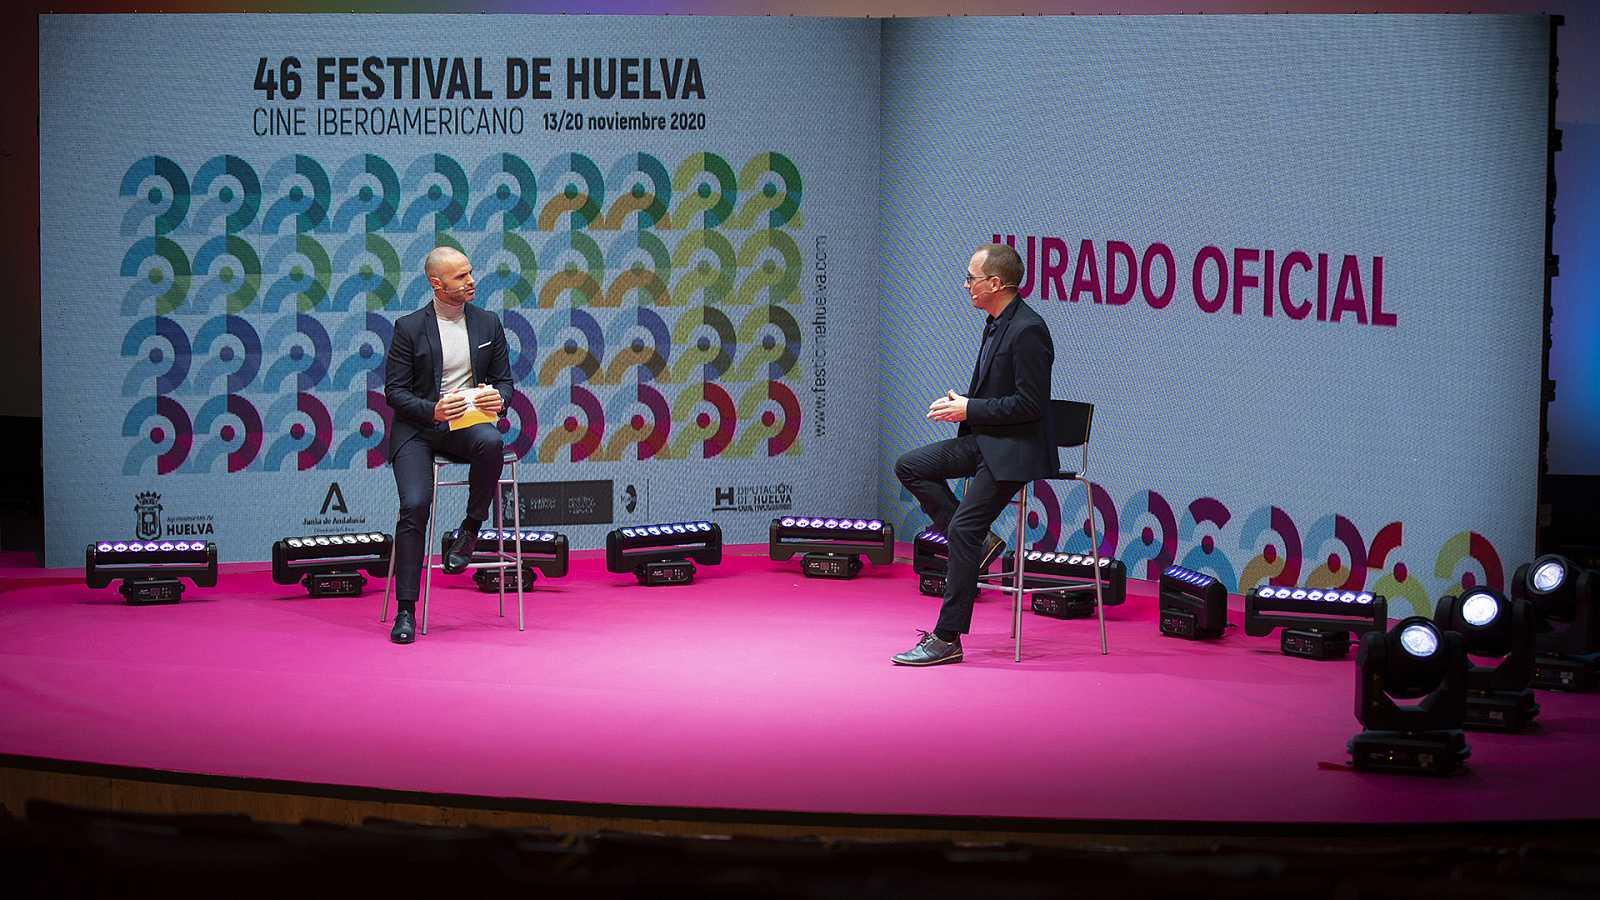 Hora América de cine - Comienza 46 Festival Iberoamericano de Huelva en edición virtual - 13/11/20 - escuchar ahora